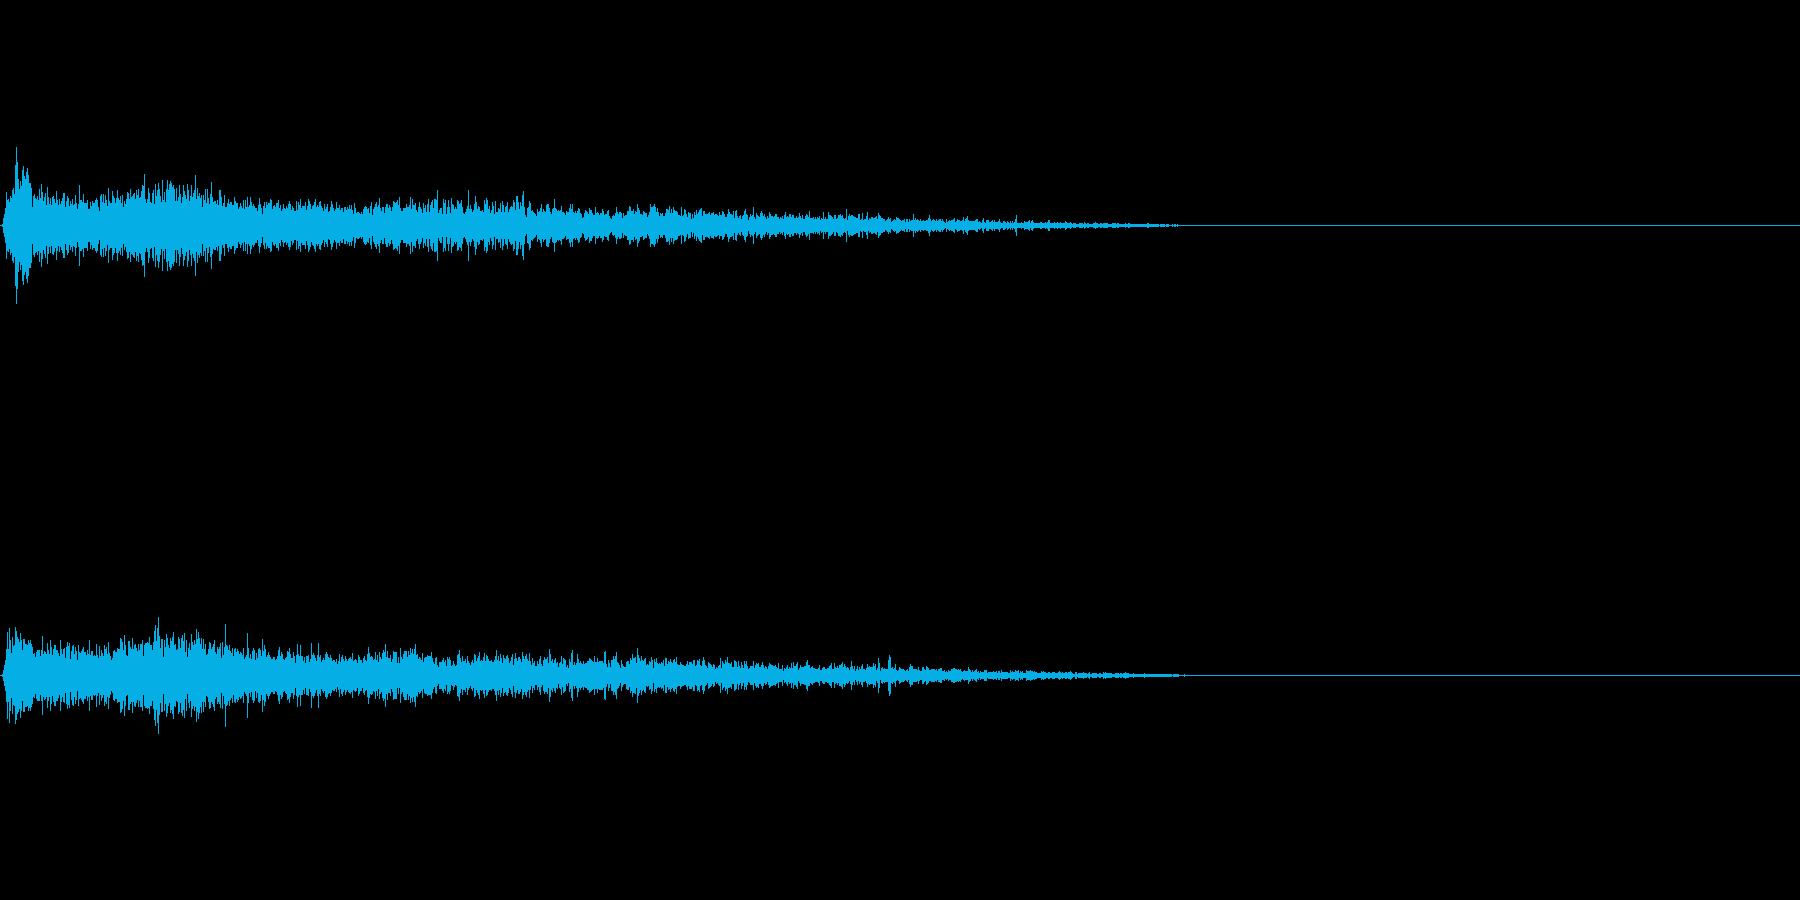 Dマイナー インパクト音 衝撃音の再生済みの波形